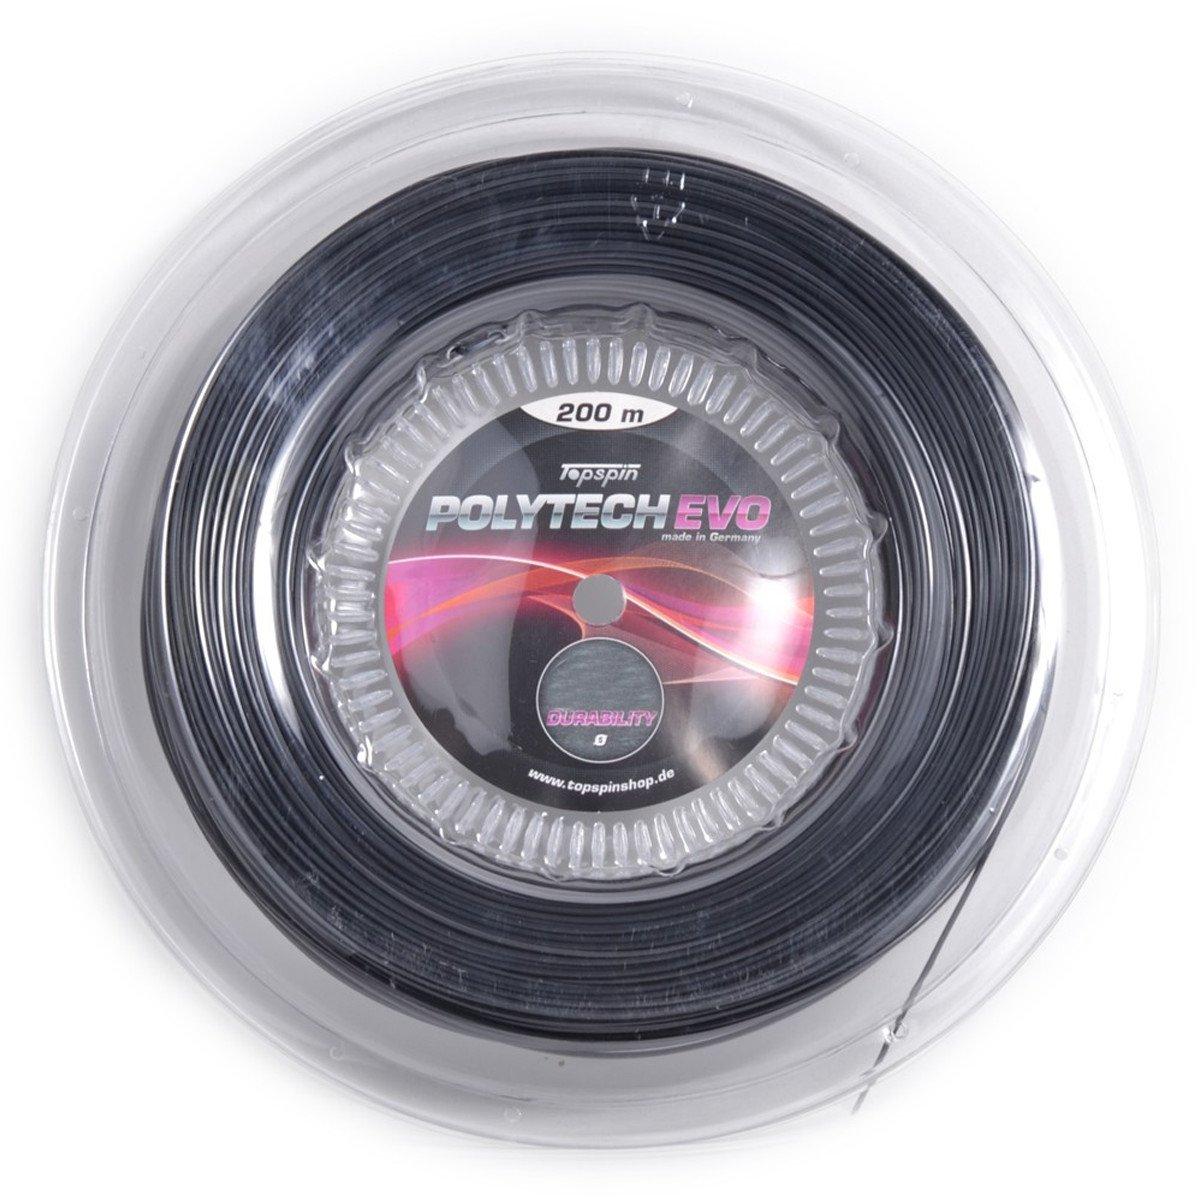 Corda Topspin Polytech Evo Hexagonal Special Ed 1,27mm - Rolo com 220m